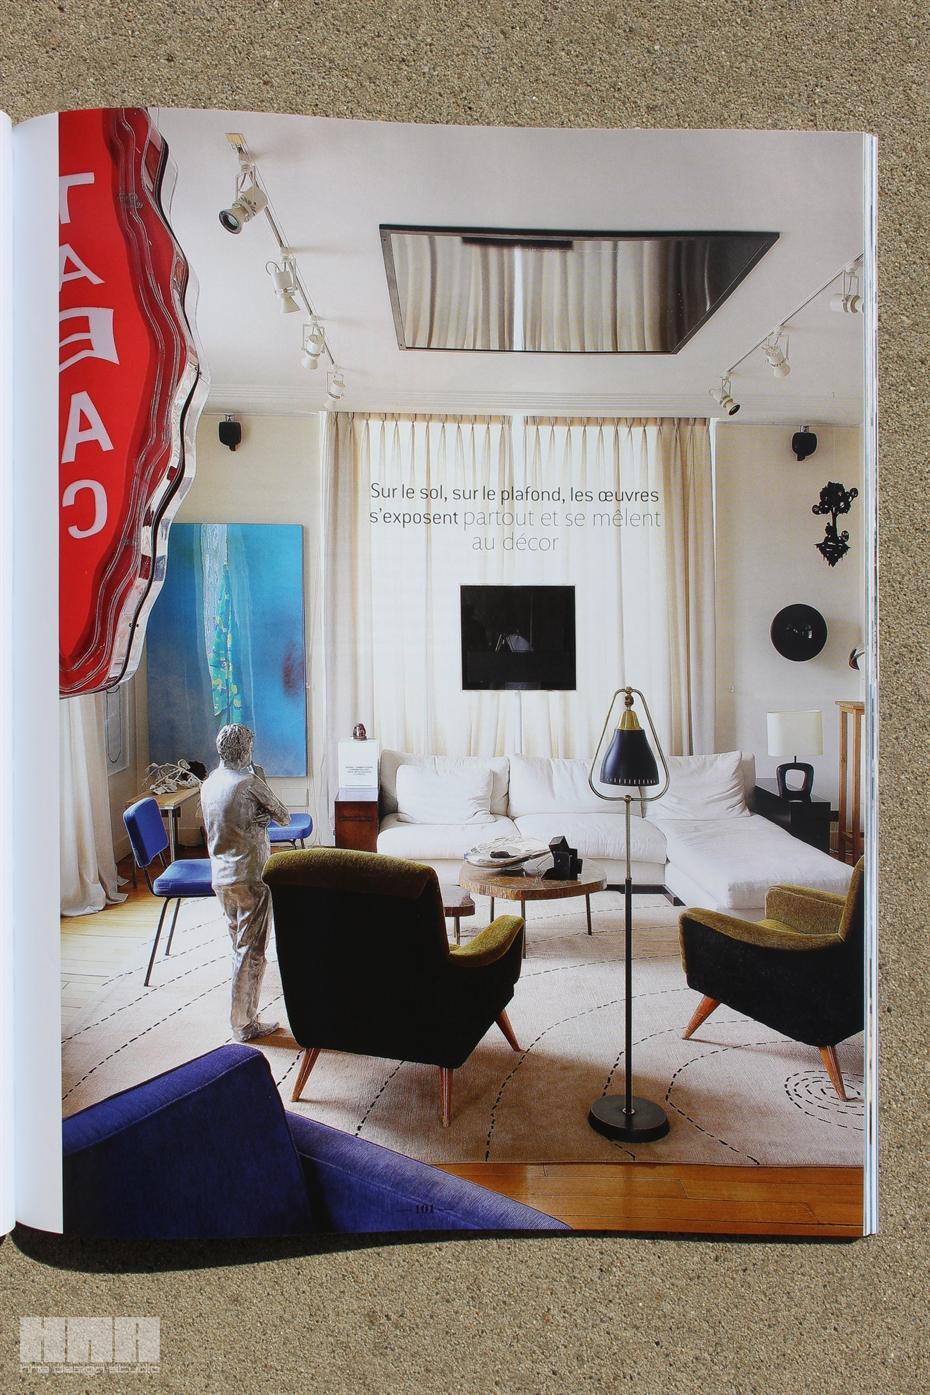 hna design inspiralo magazinok paris 18